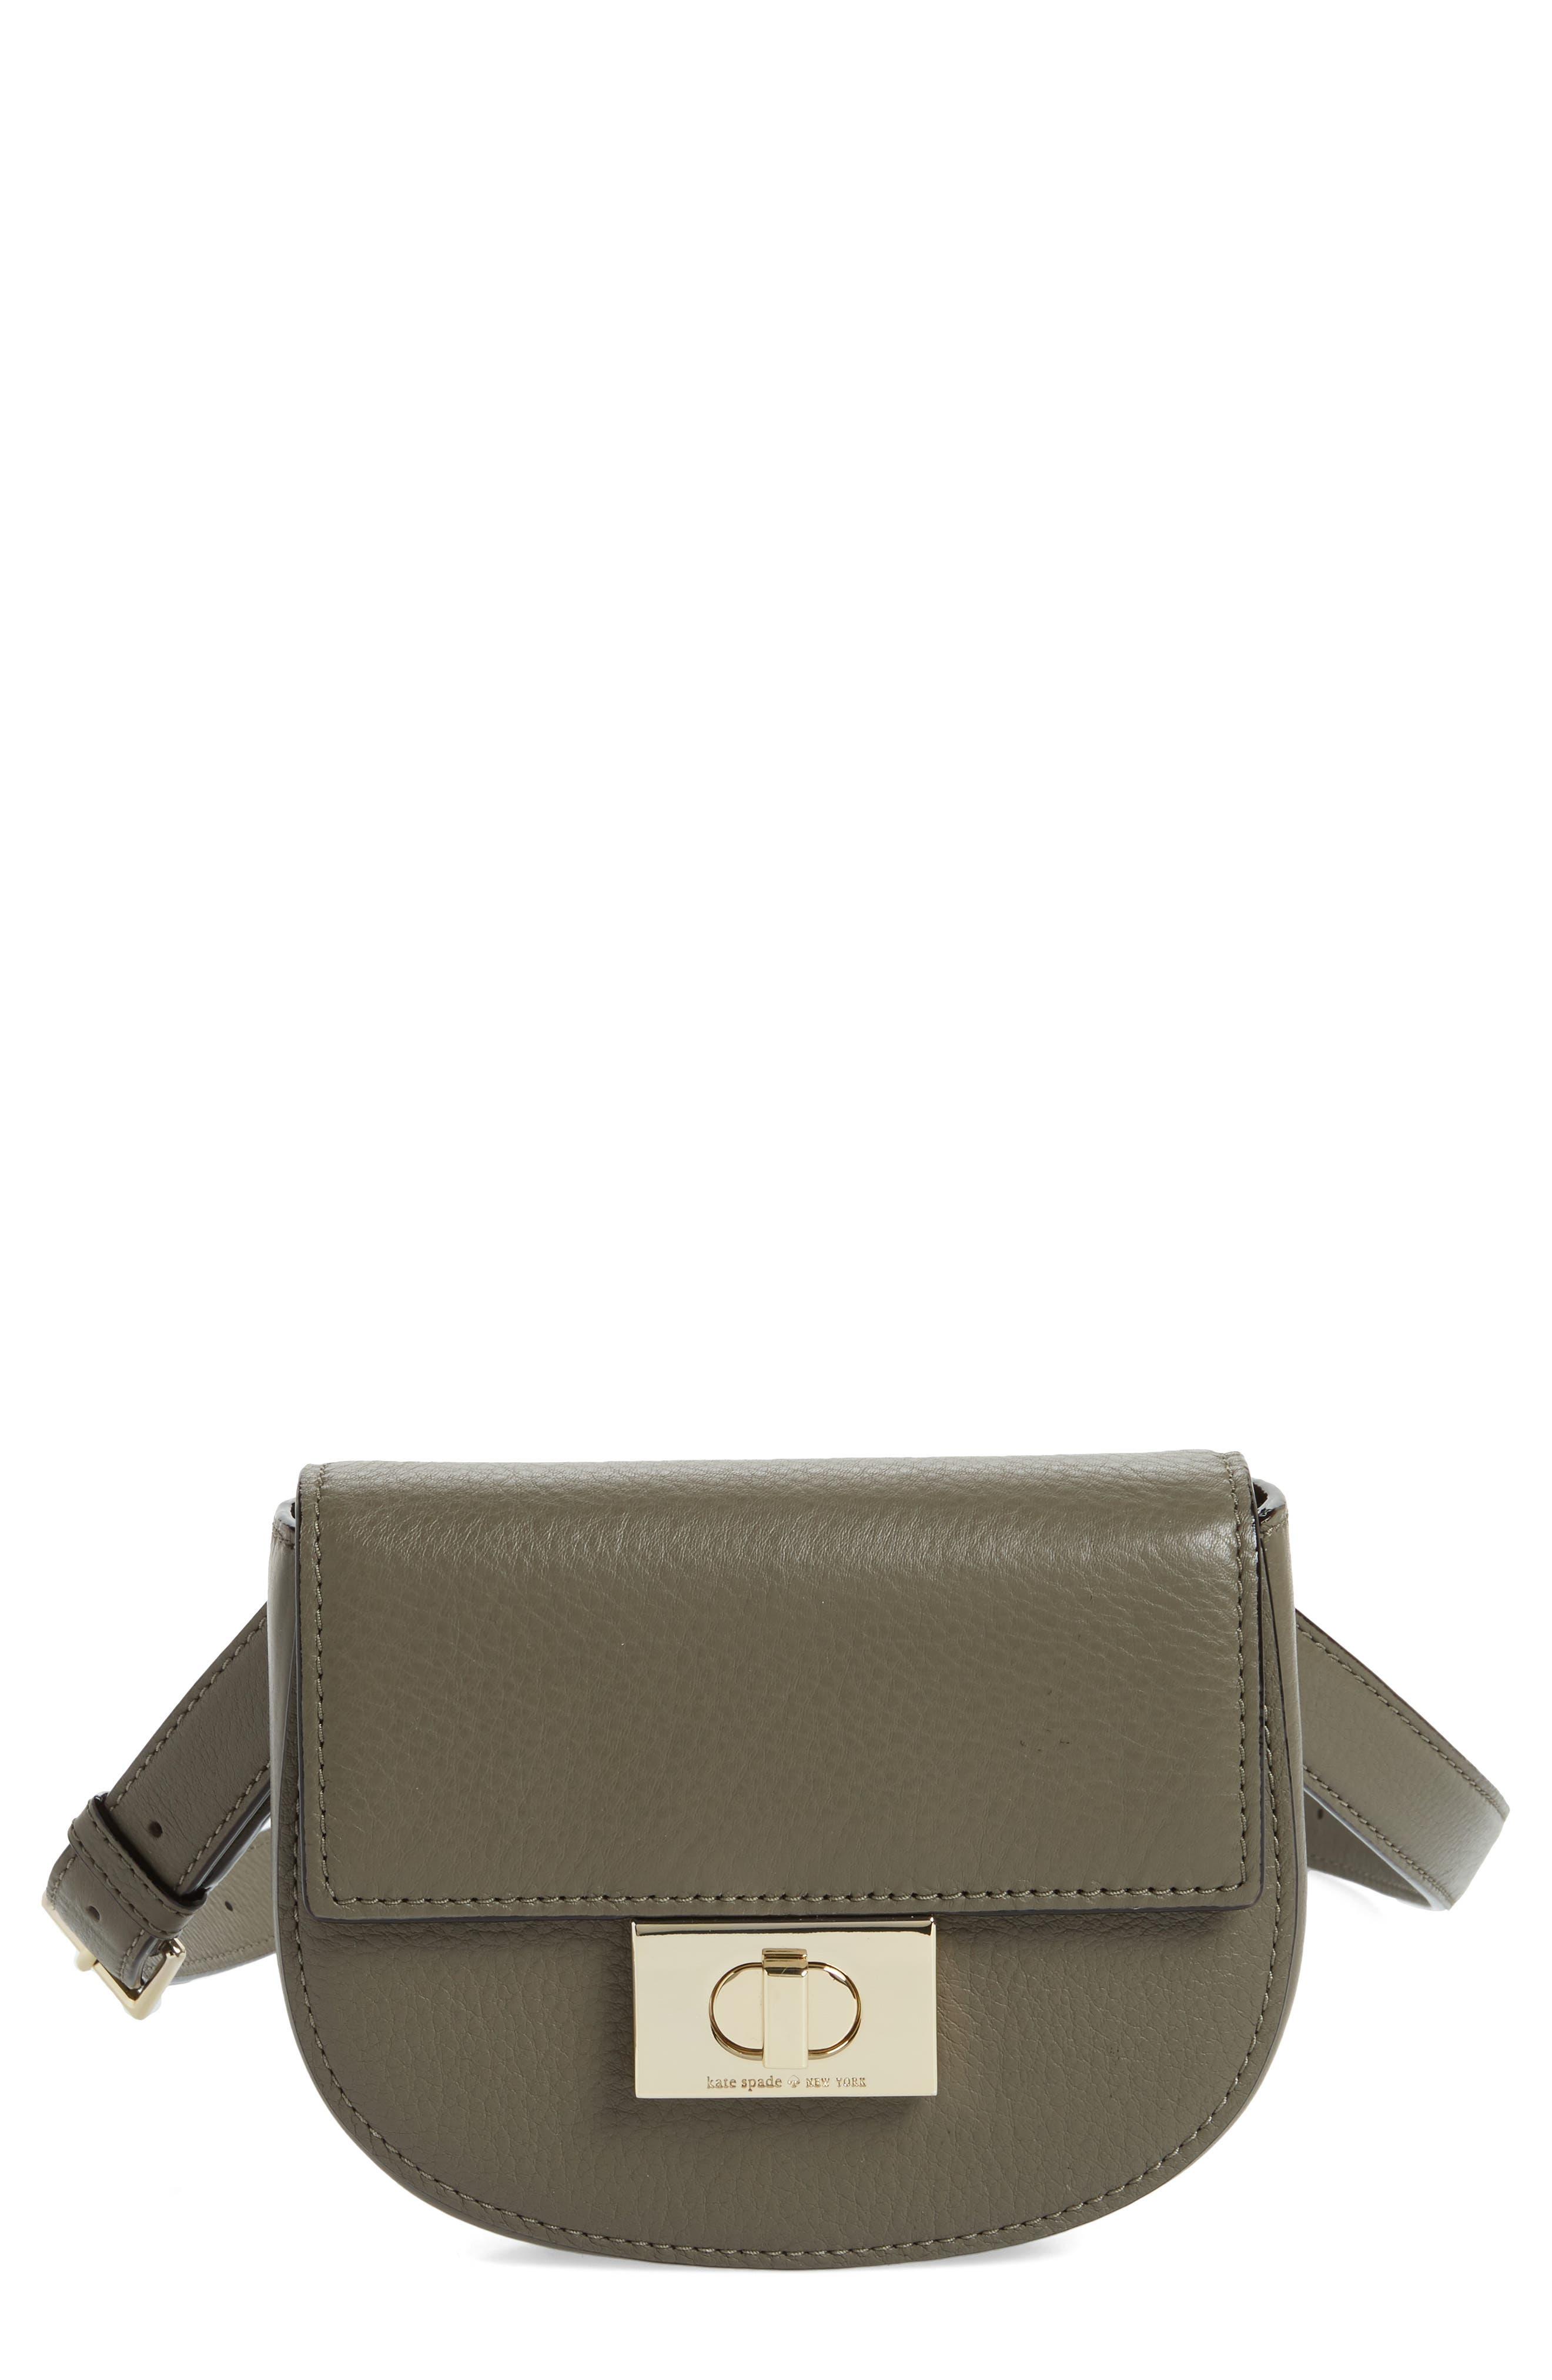 Alternate Image 1 Selected - kate spade new york greenwood place rita leather belt bag